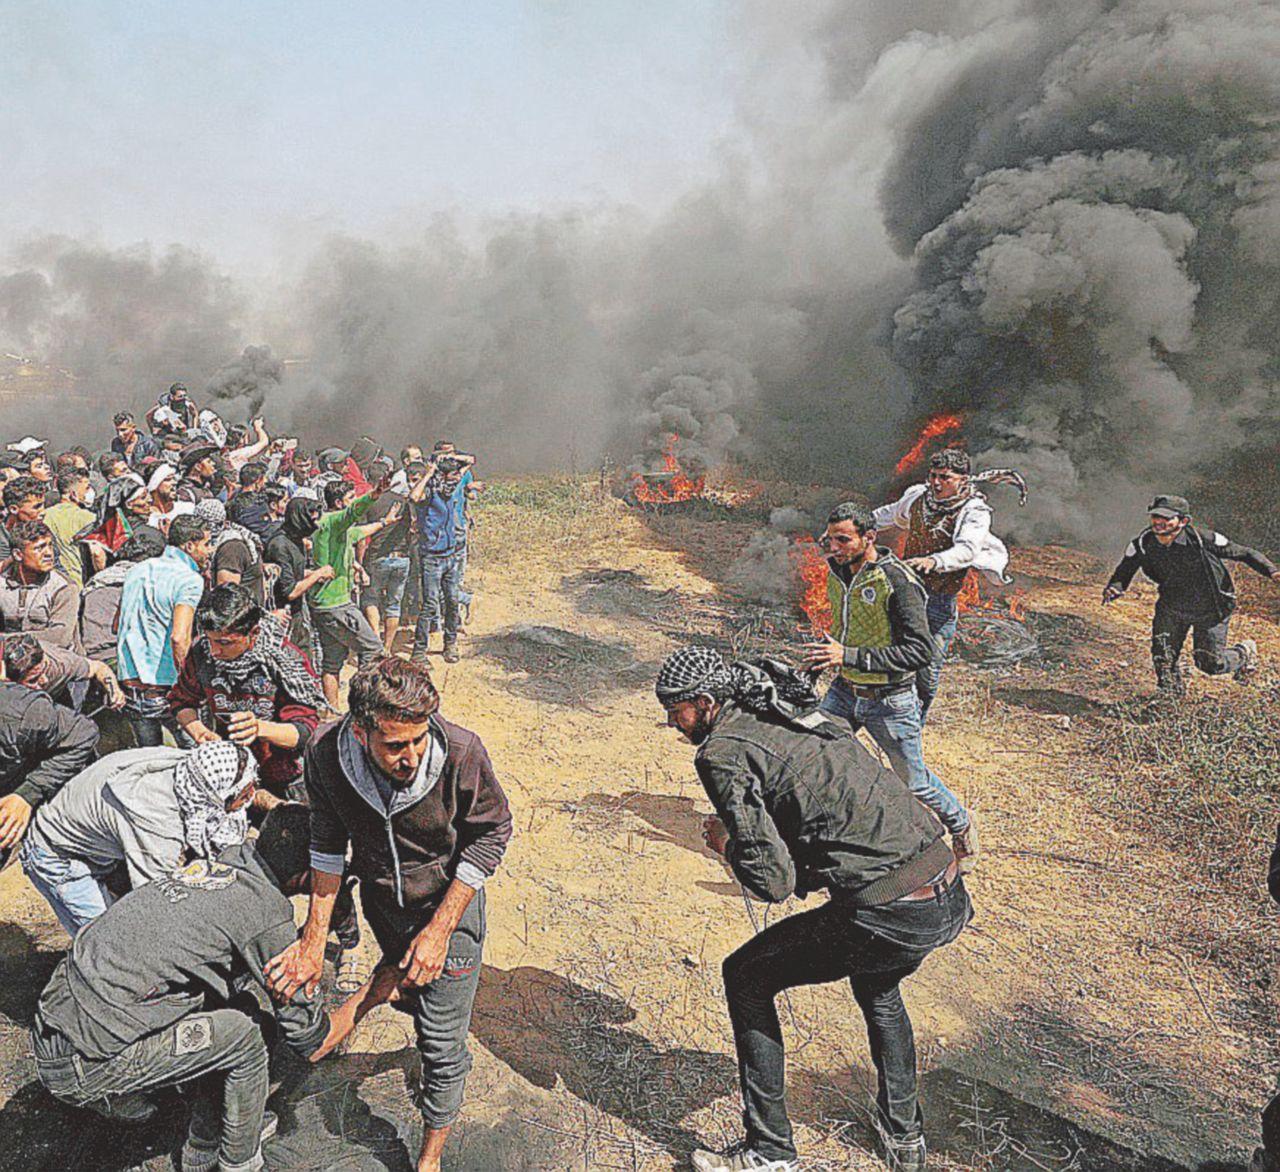 Stessa rabbia, stessi metodi Israele uccide 7 palestinesi